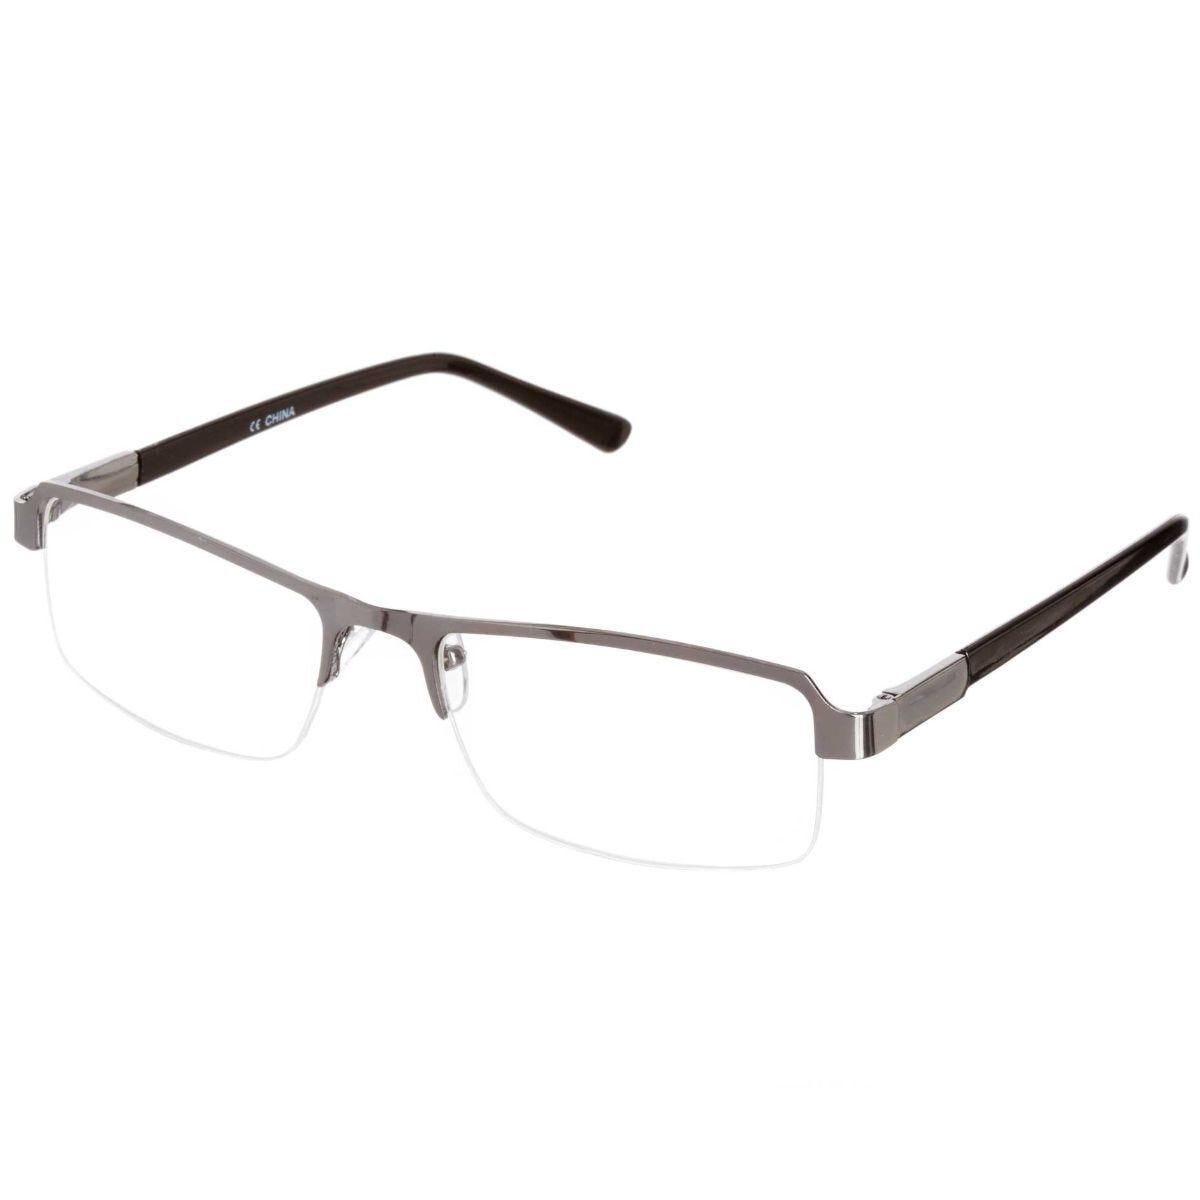 Ryman Reading Glasses + 2.0 Half Frame